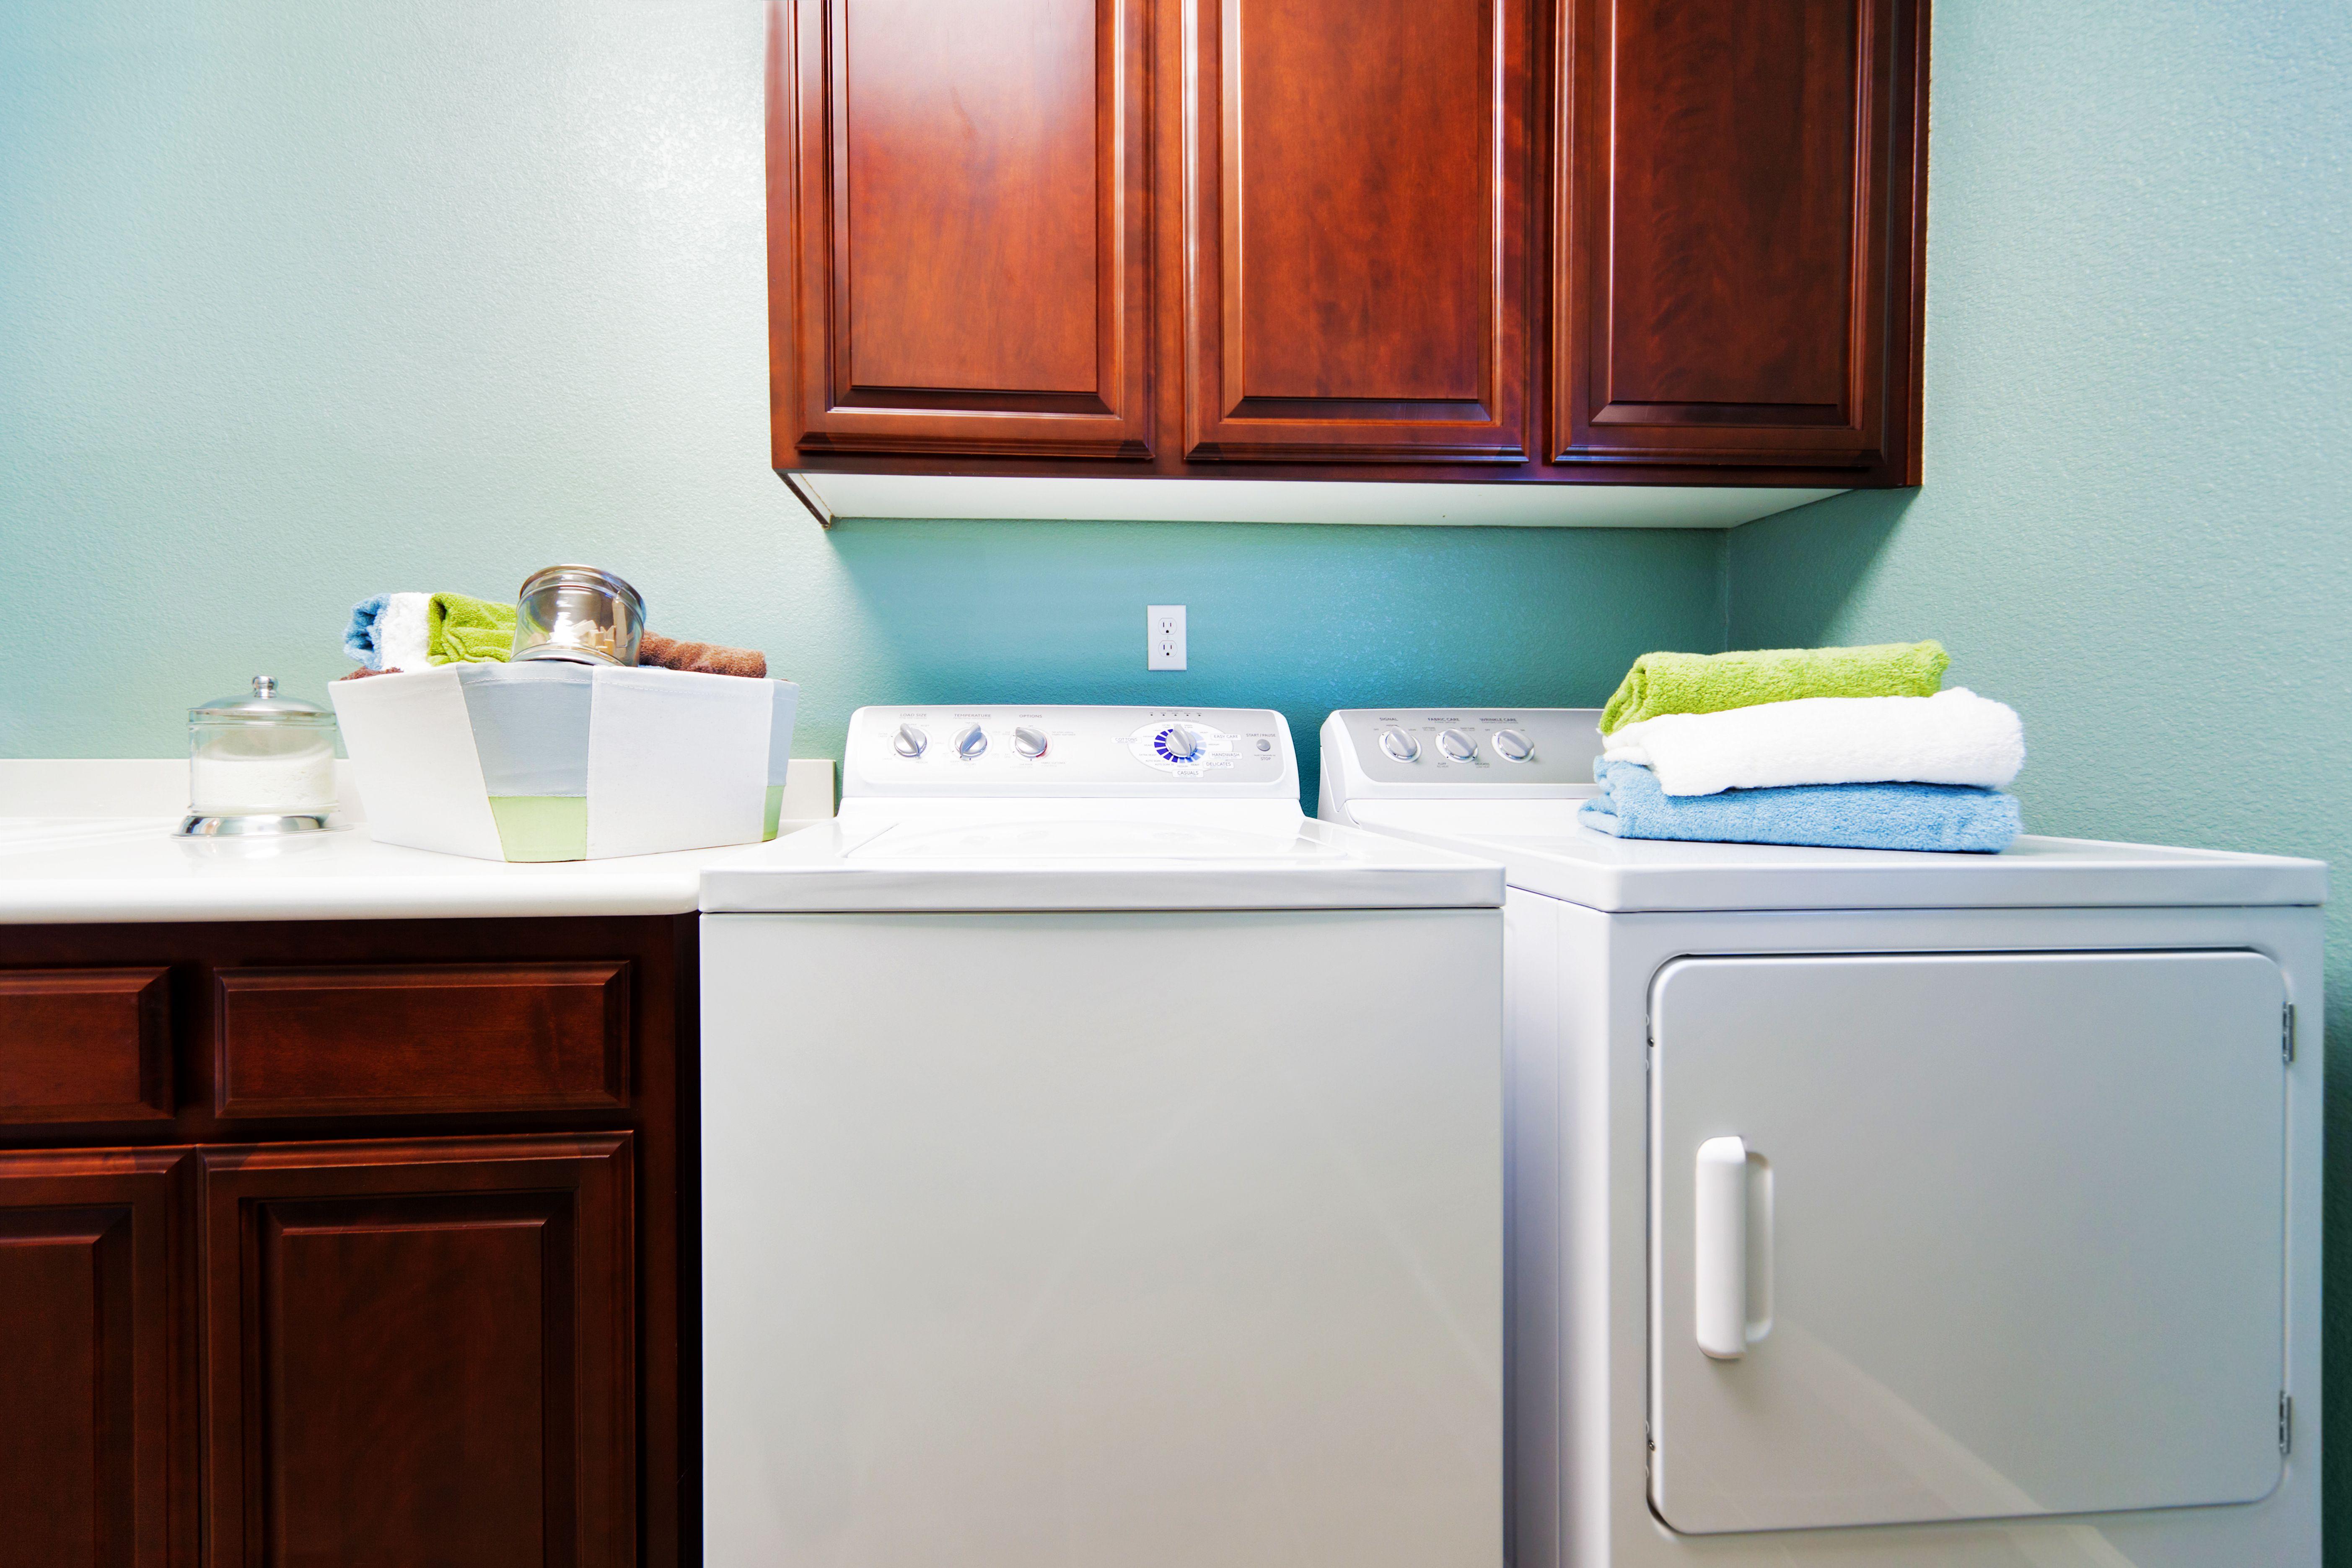 Eliminate Fire Danger by Simple Dryer Vent Maintenance